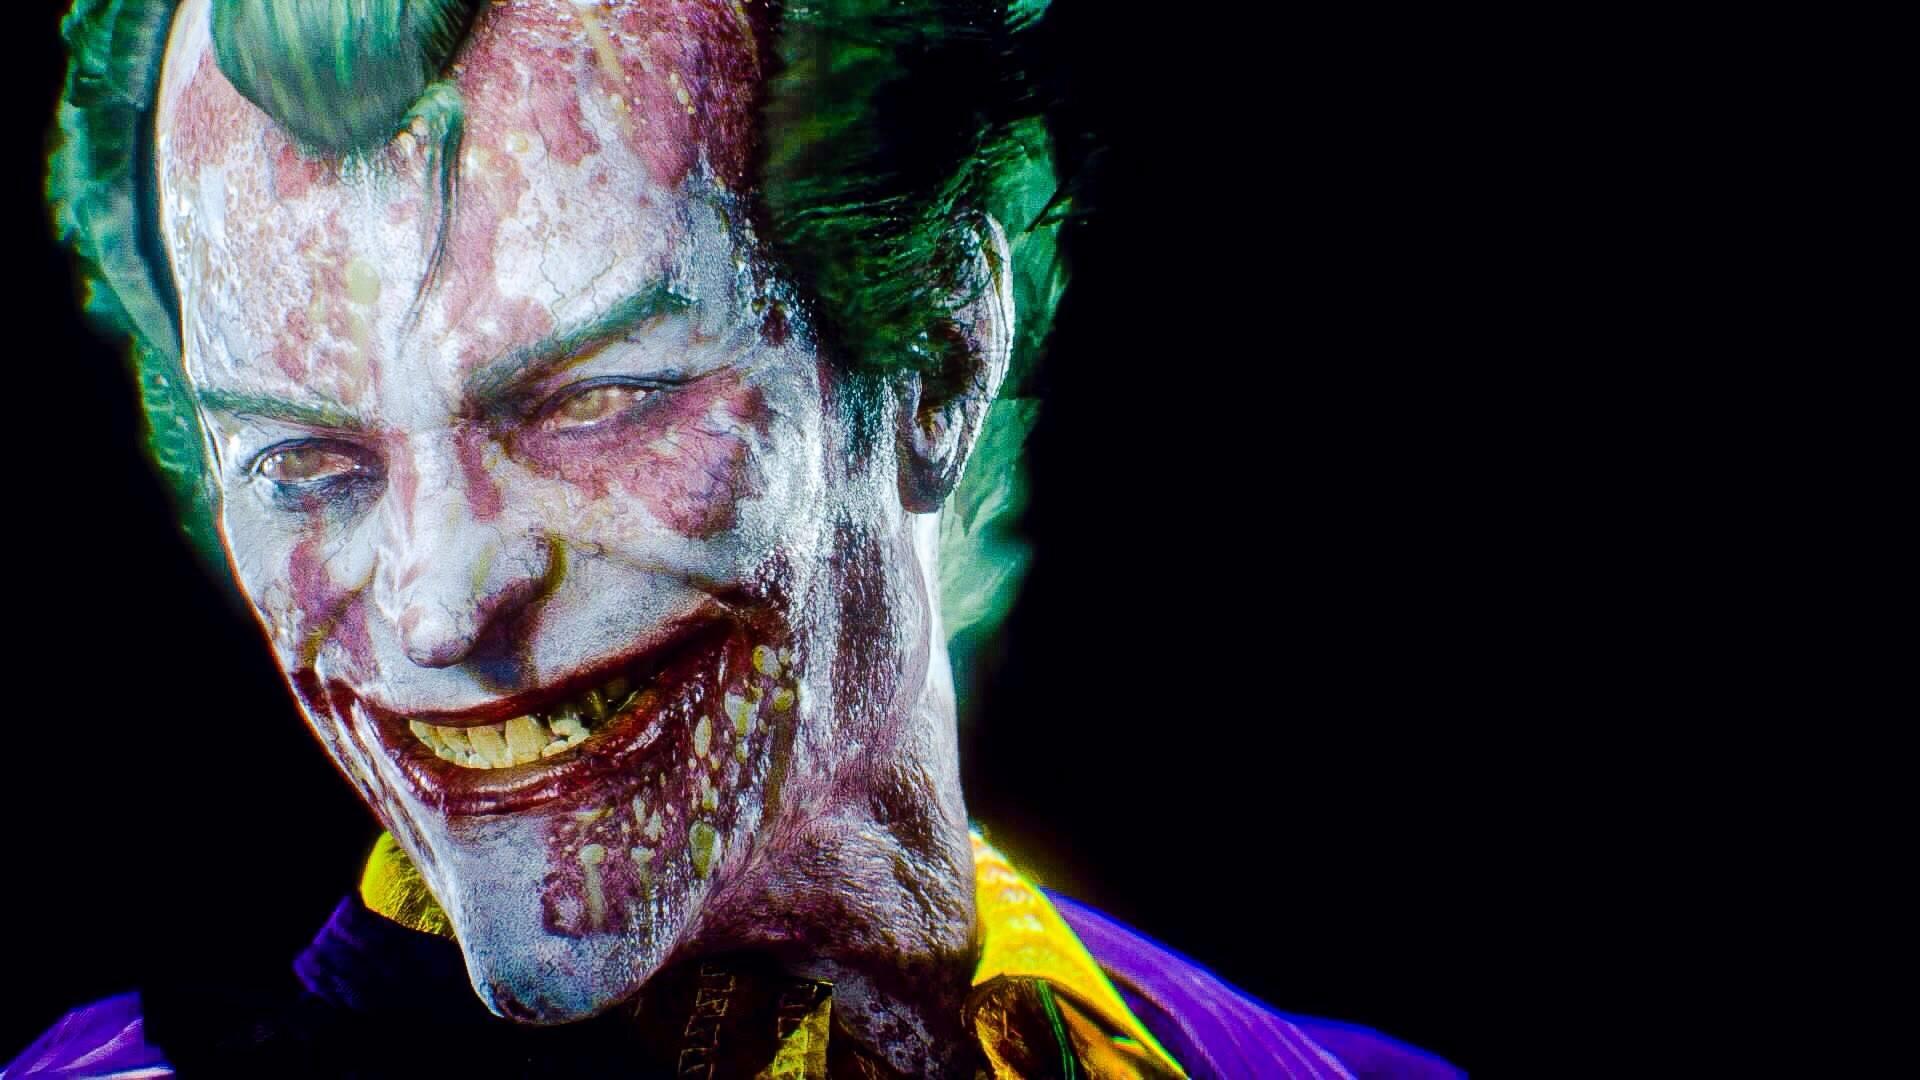 Joker Arkhamverse Gallery Villains Wiki